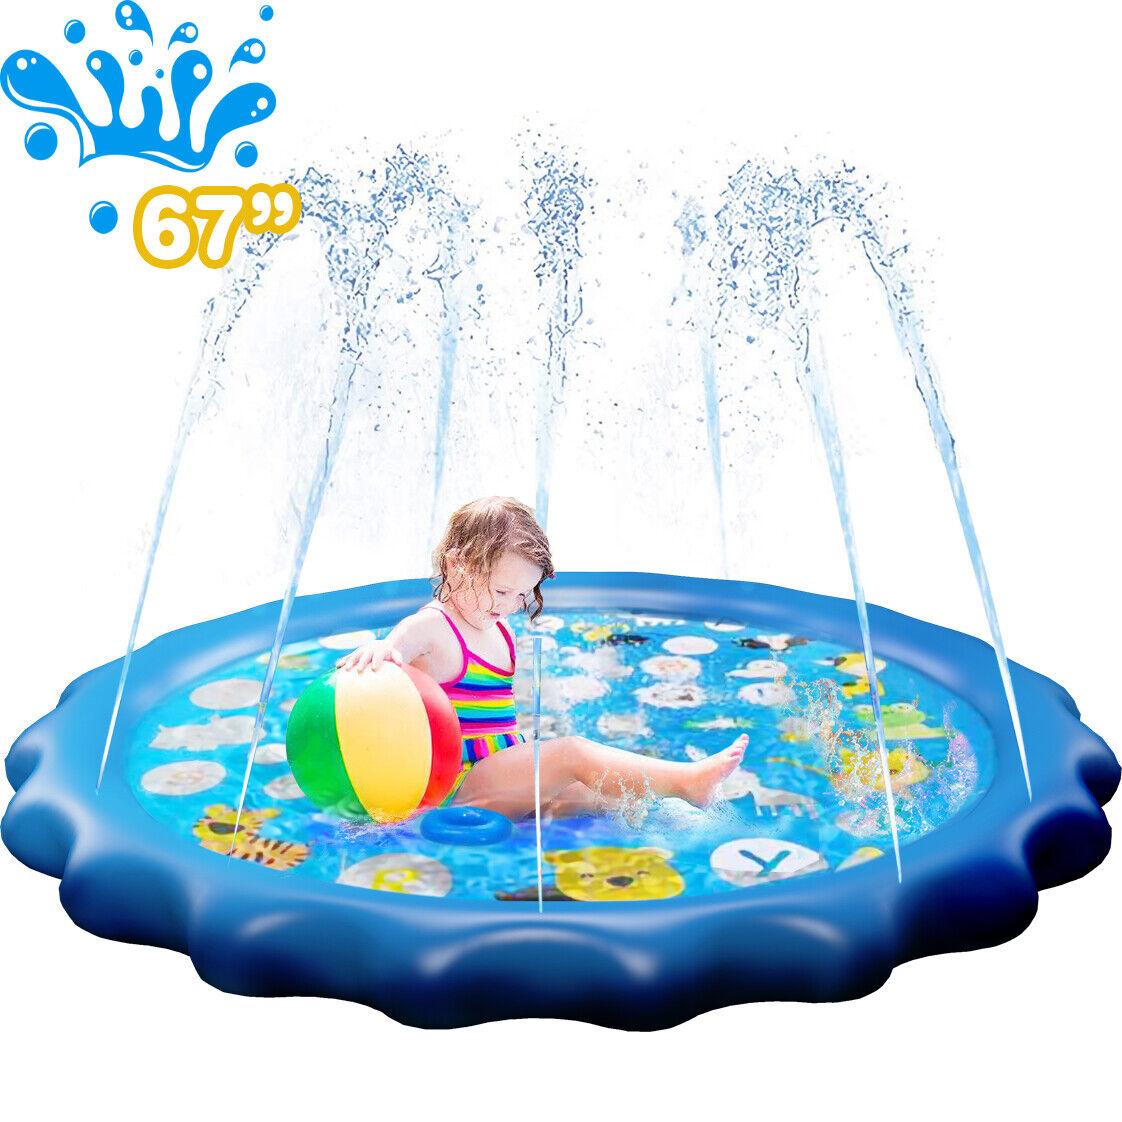 Sprinkler Splash Pad Kids Toddlers 67 inch Water Spray Play Mat Backyard Pool